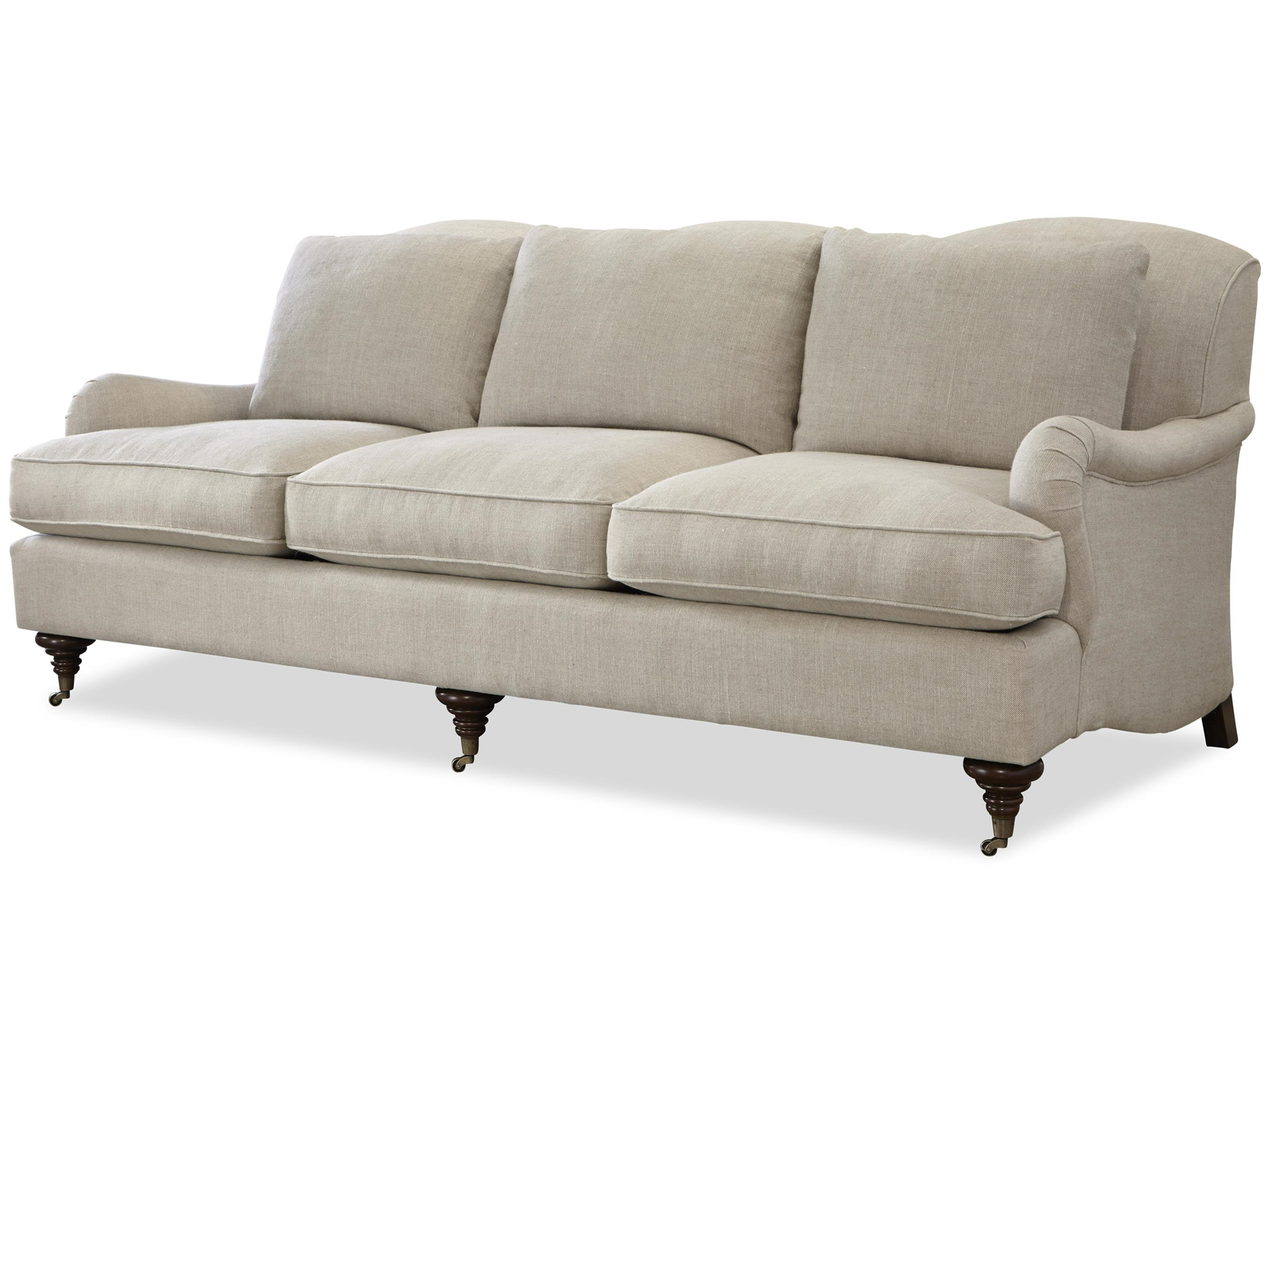 Etonnant Churchill Linen Upholstered English Rolled Arm Sofa